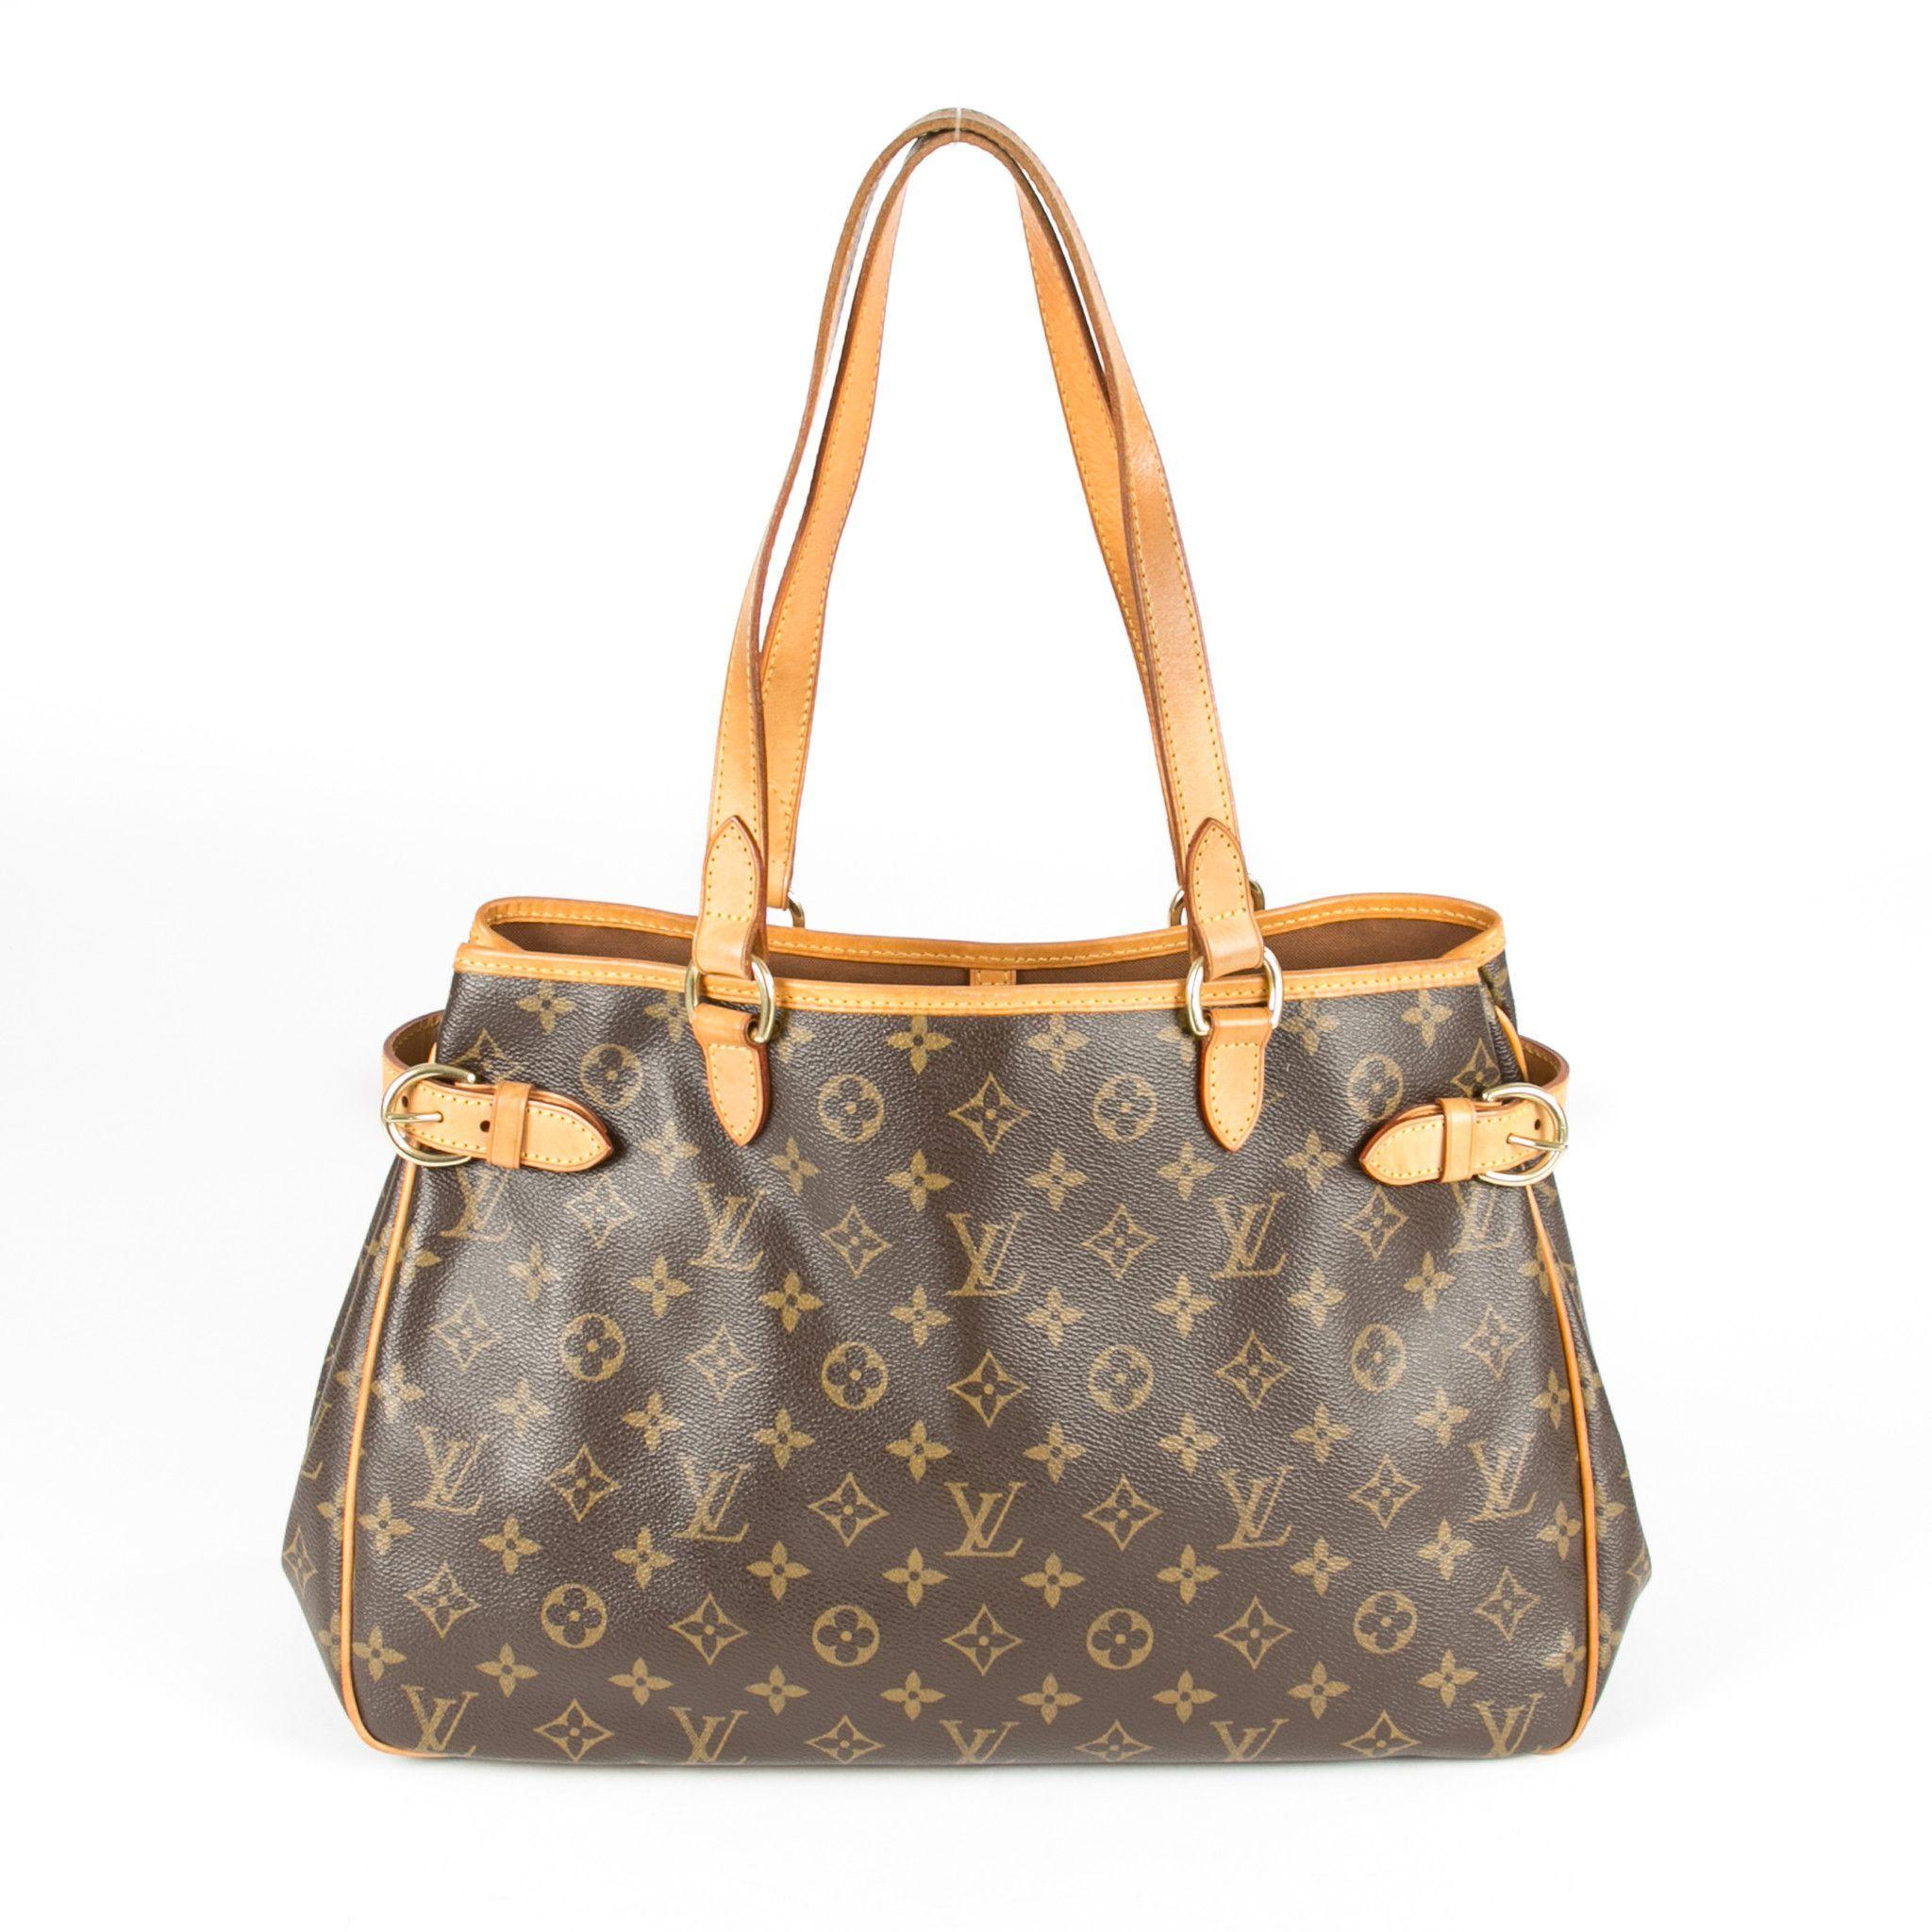 3bd6bef1b62 Louis Vuitton Batignolles Horizontal (Authentic Pre Owned) | Bags ...